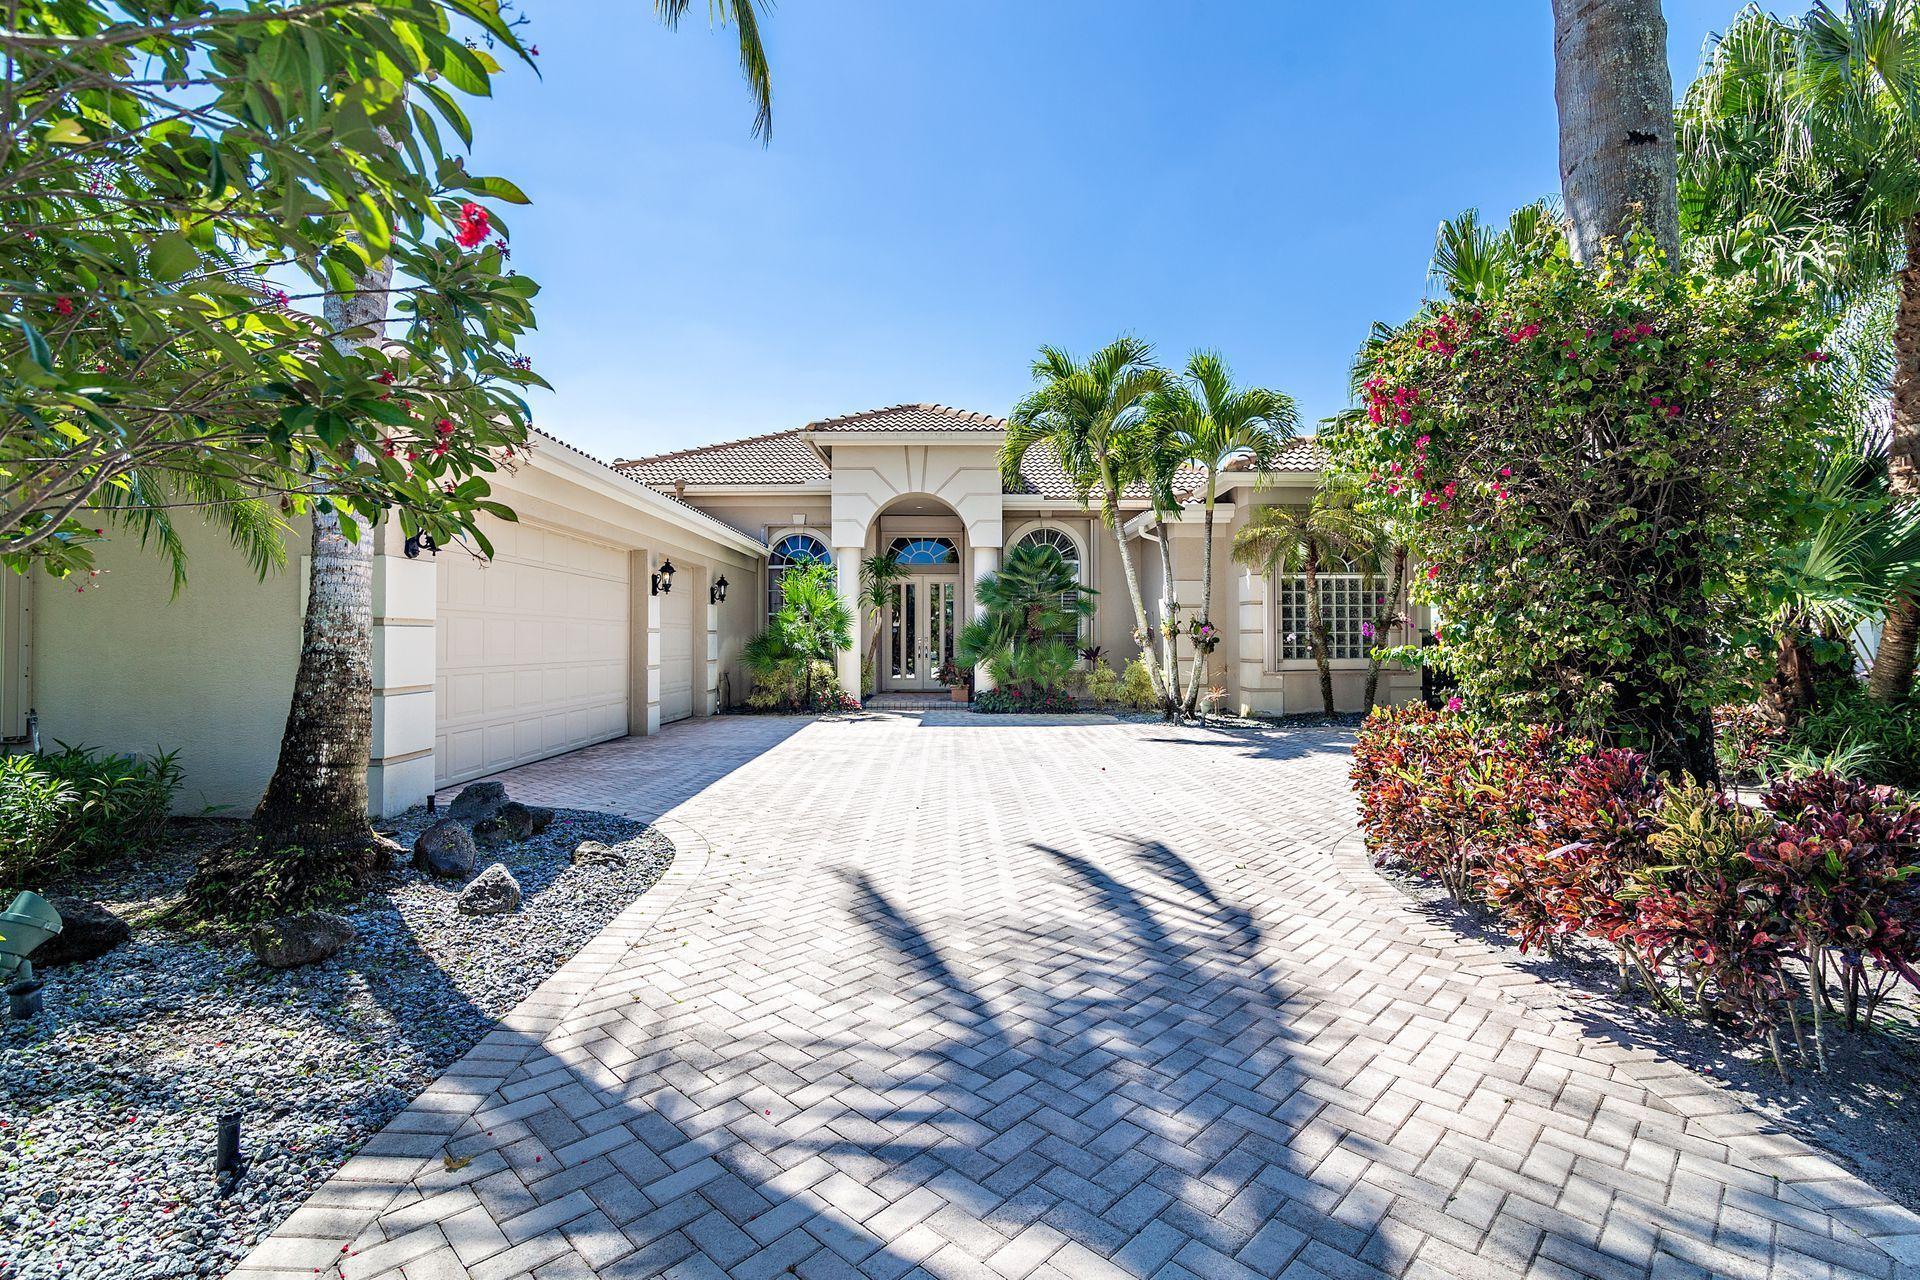 44 Bermuda Lake Drive, Palm Beach Gardens, Florida 33418, 4 Bedrooms Bedrooms, ,4.1 BathroomsBathrooms,A,Single family,Bermuda Lake,RX-10516544